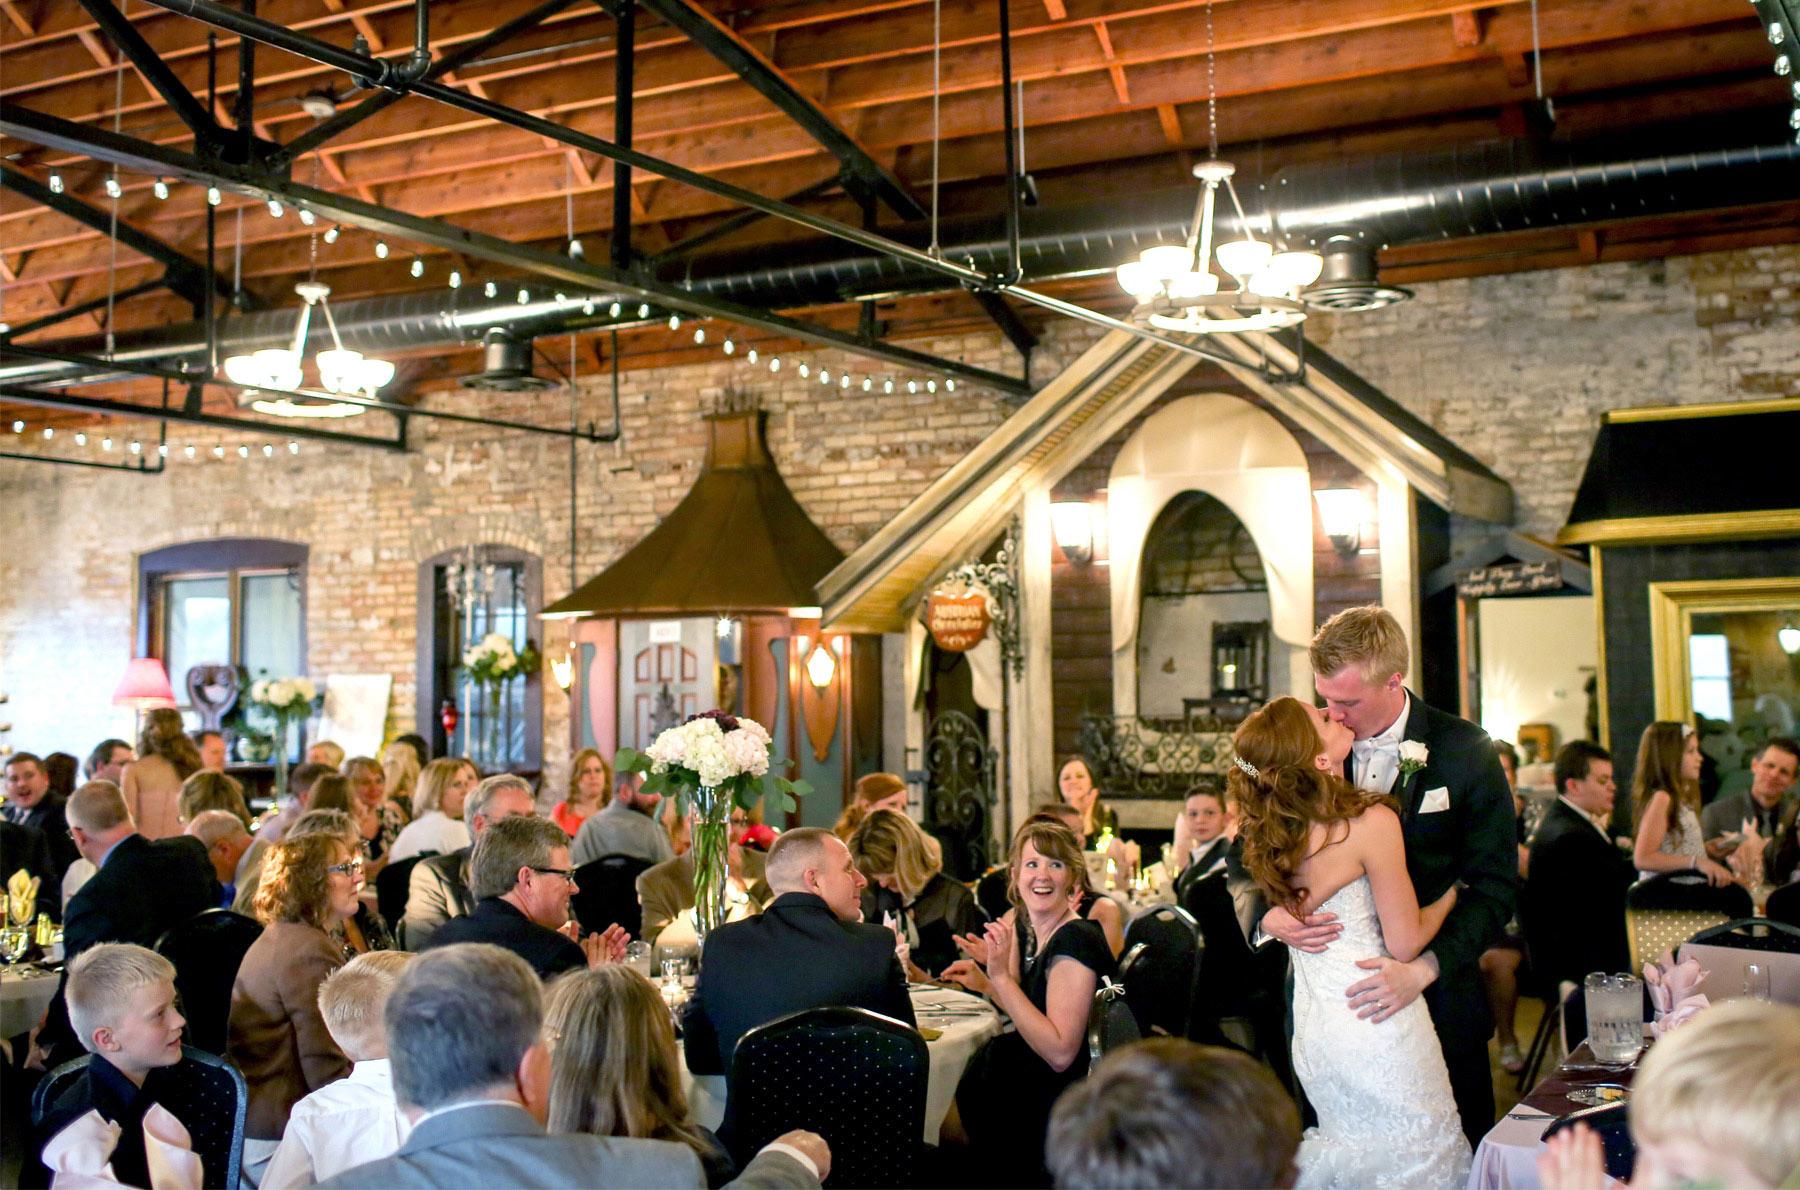 14-Minneapolis-Minnesota-Wedding-Photography-by-Vick-Photography-Reception-Kellermans-Event-Center-Tianna-&-Matt.jpg